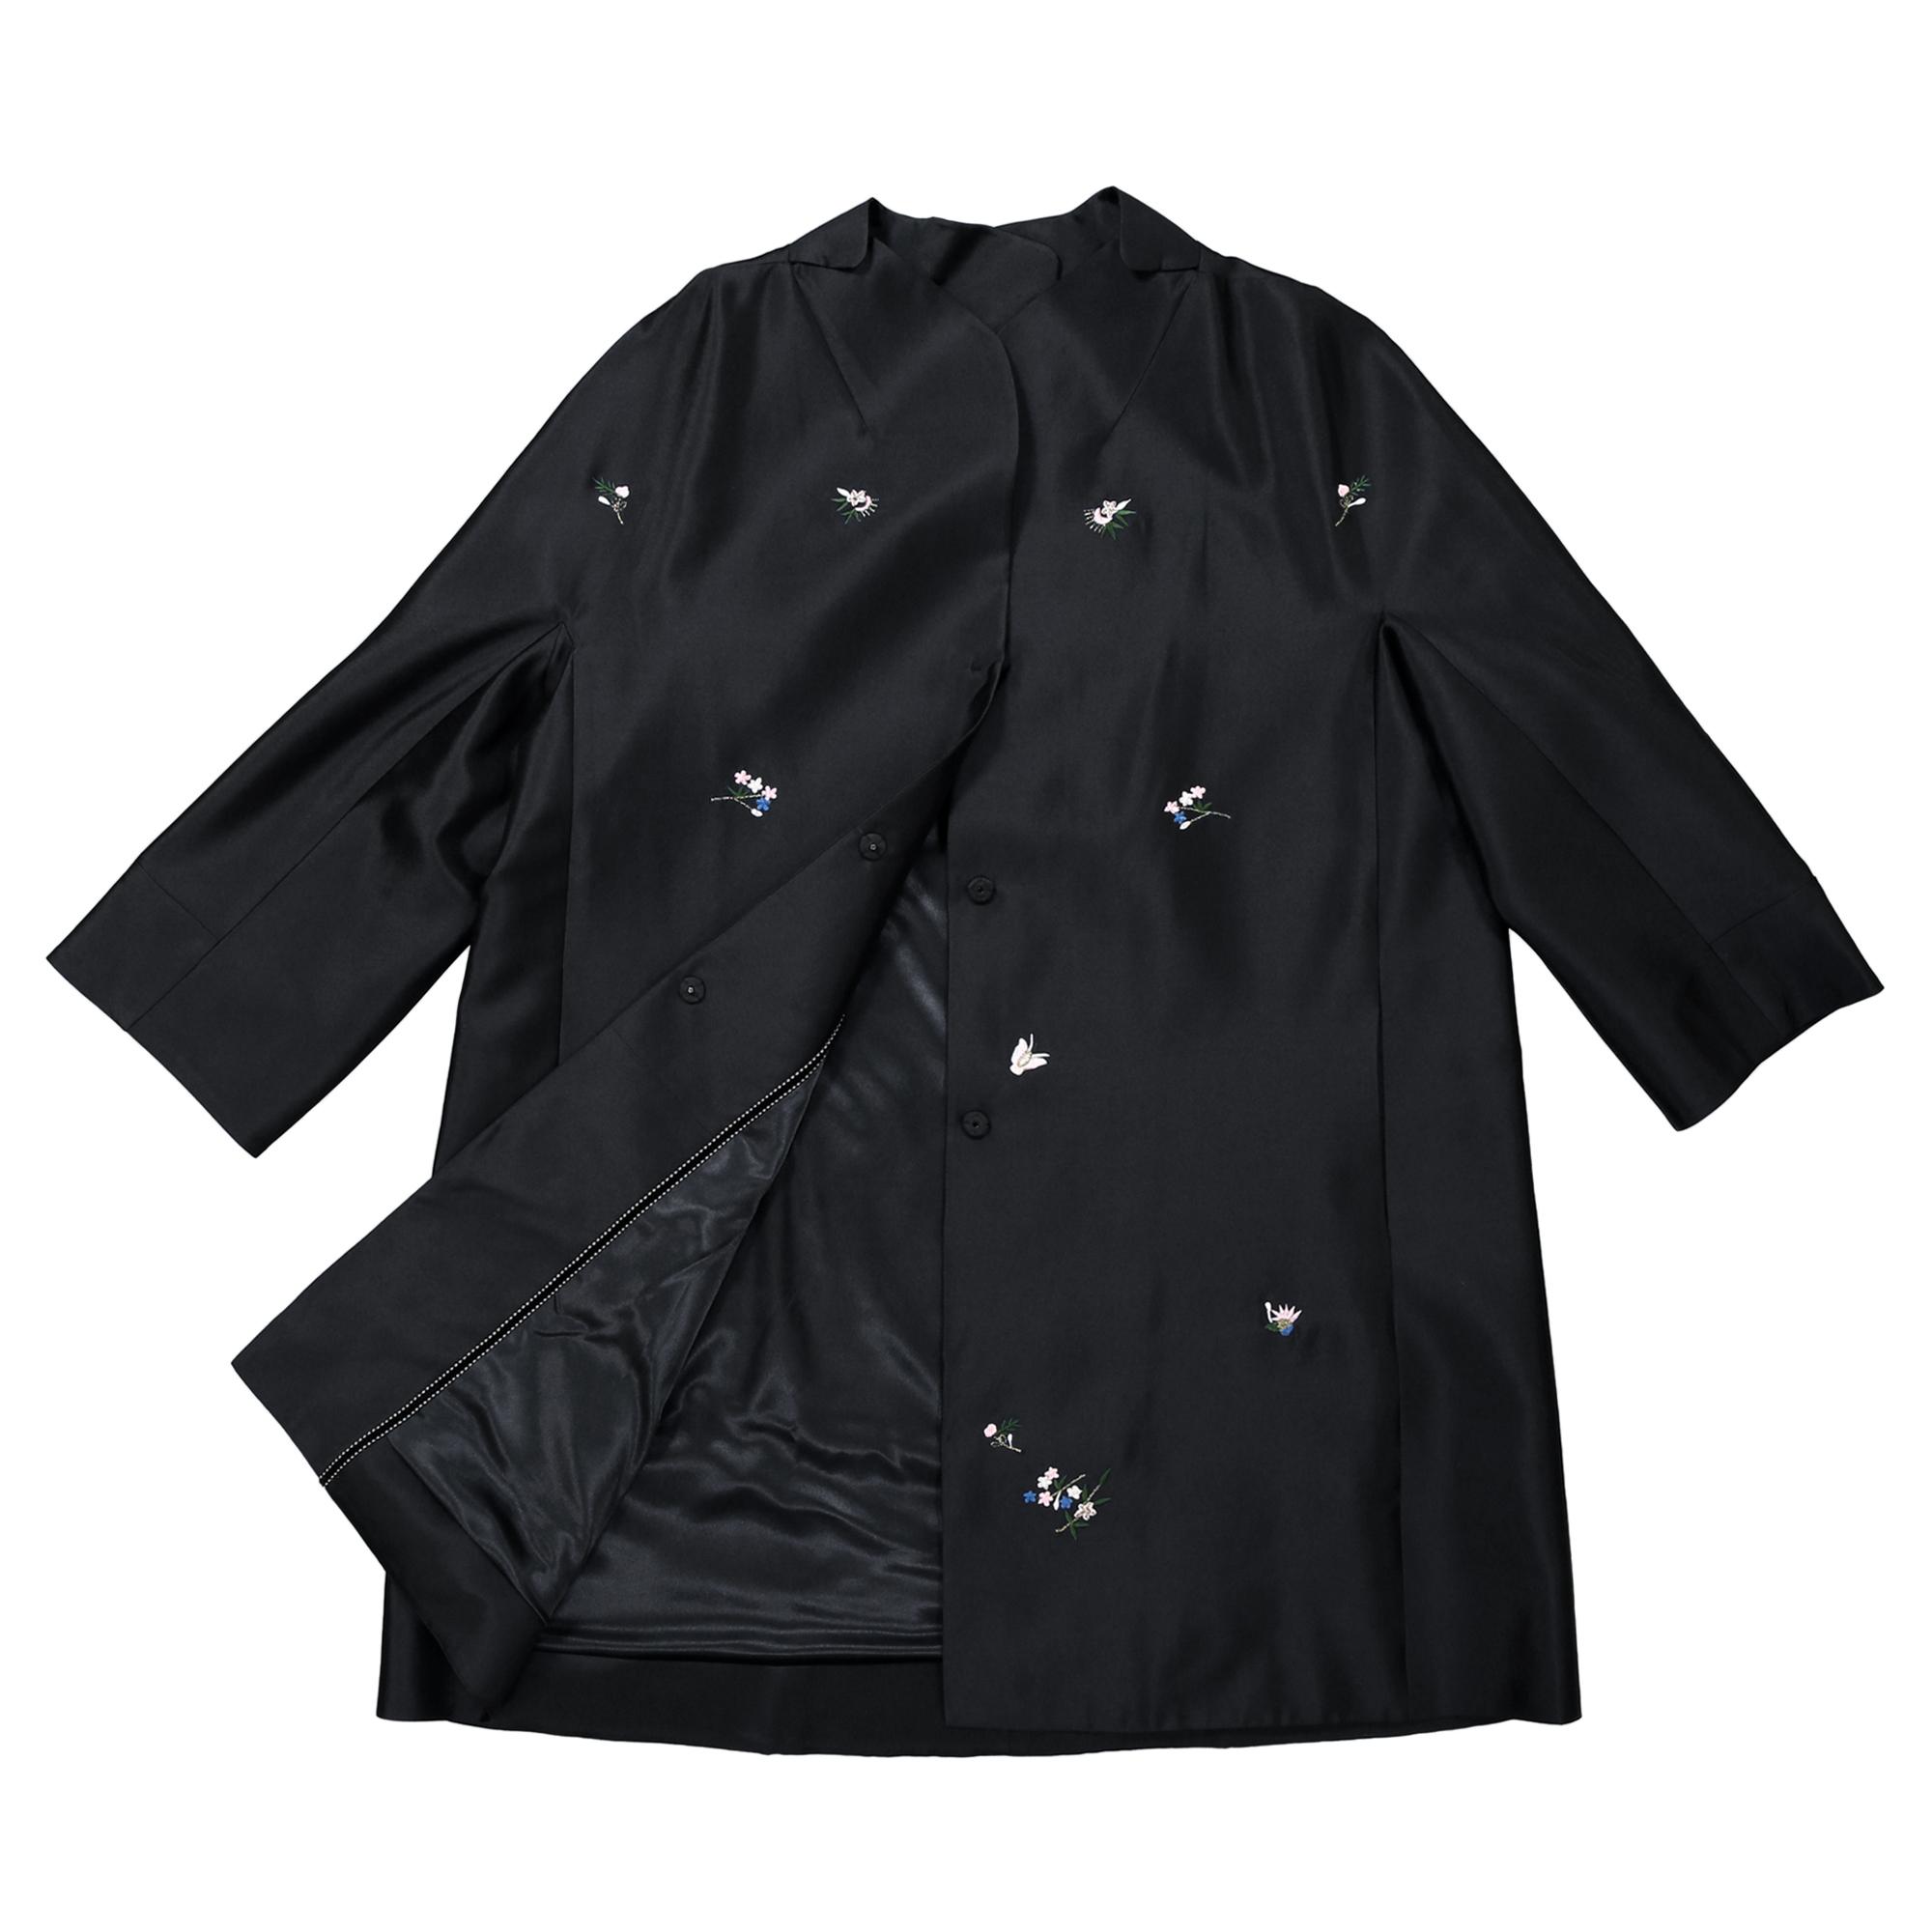 Silk+Jacket,+Black+(2.800+DKK)_2.jpg